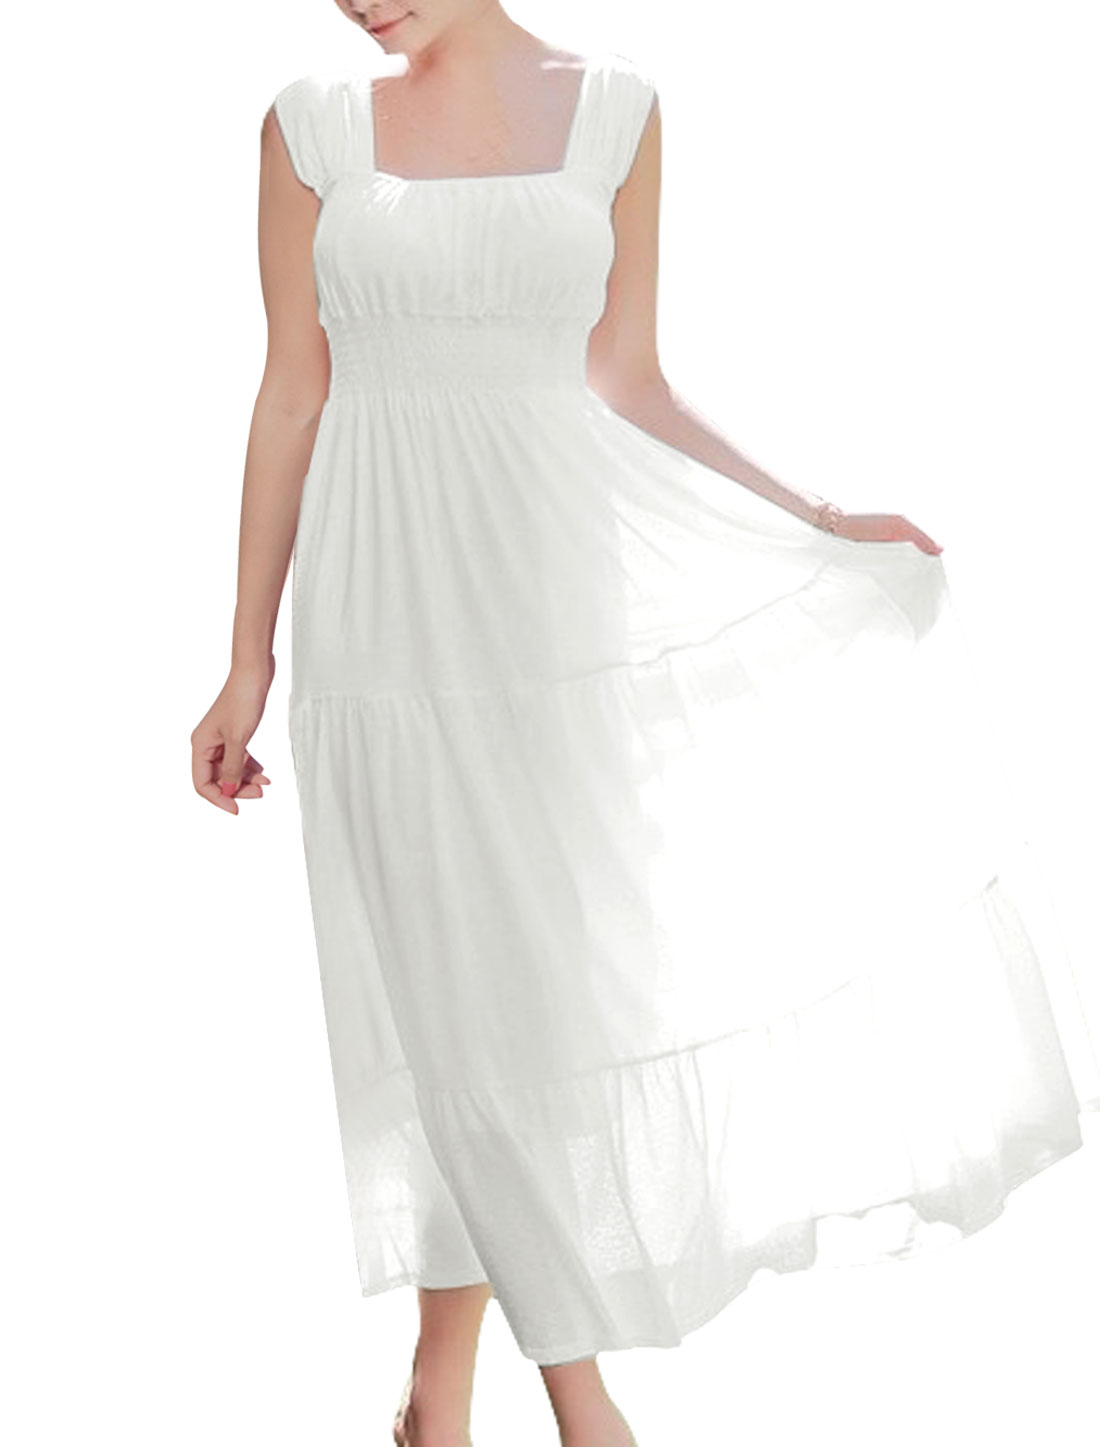 Lady Elegant Square Neck Smocked Waist Lining Peasant Dress White L